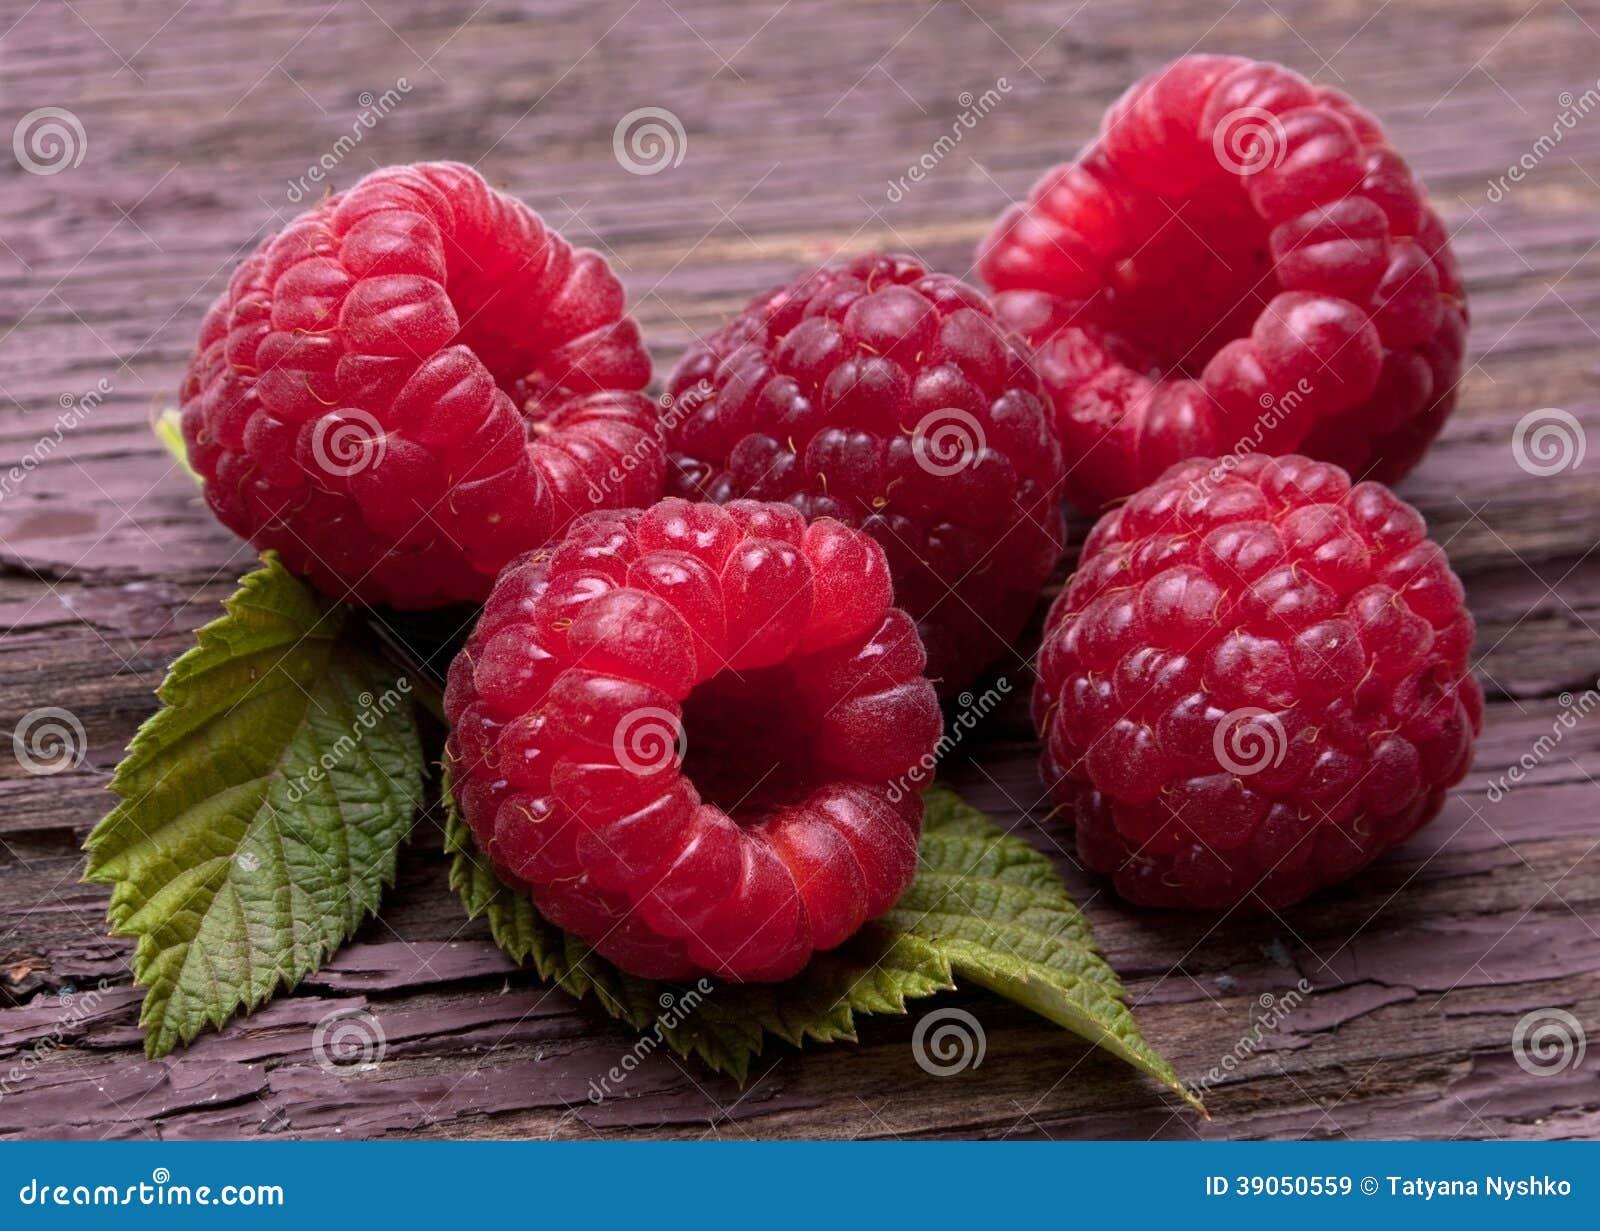 Raspberry fruit on wood